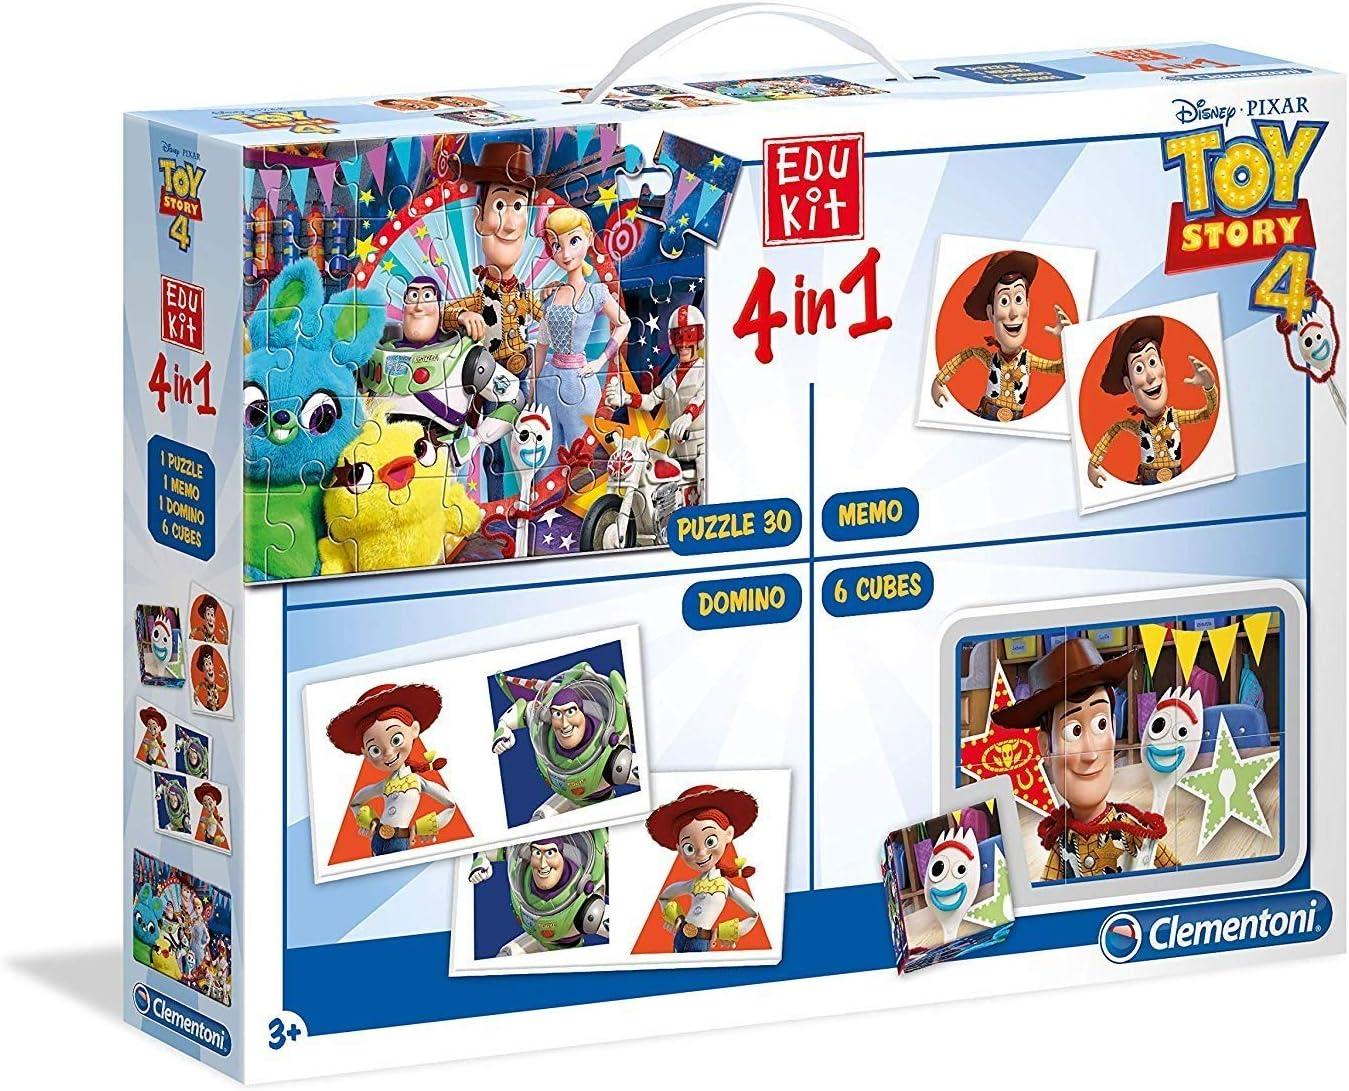 Clementoni - Edukit 4 En 1 Toy Story 4 (18058)